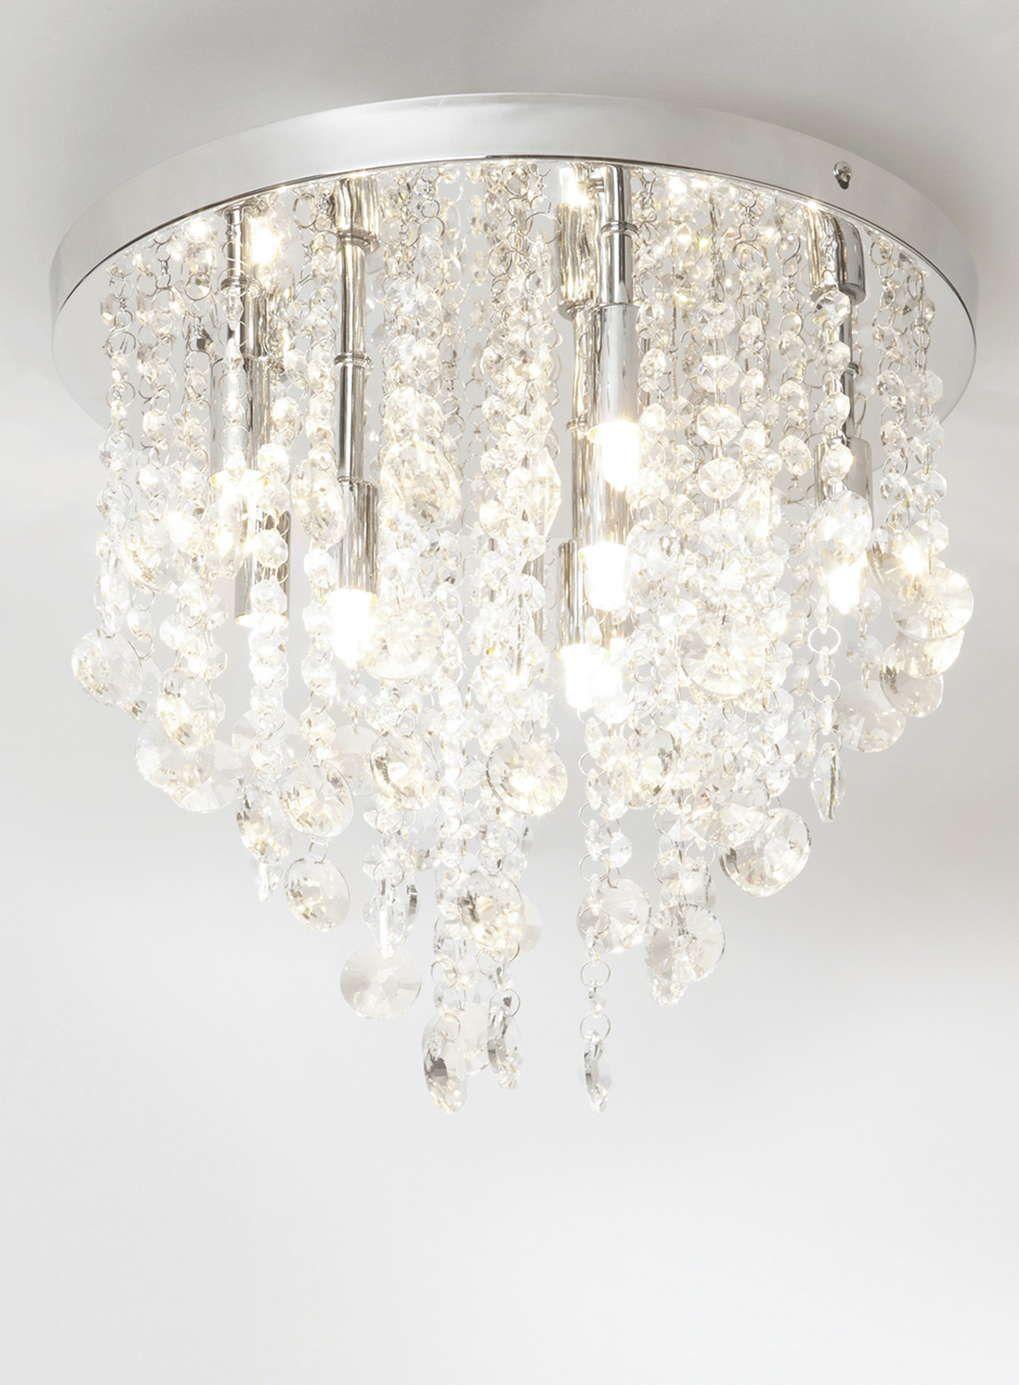 Iris Crystal Flush Light - BHS   Home ideas   Pinterest   Bhs ...